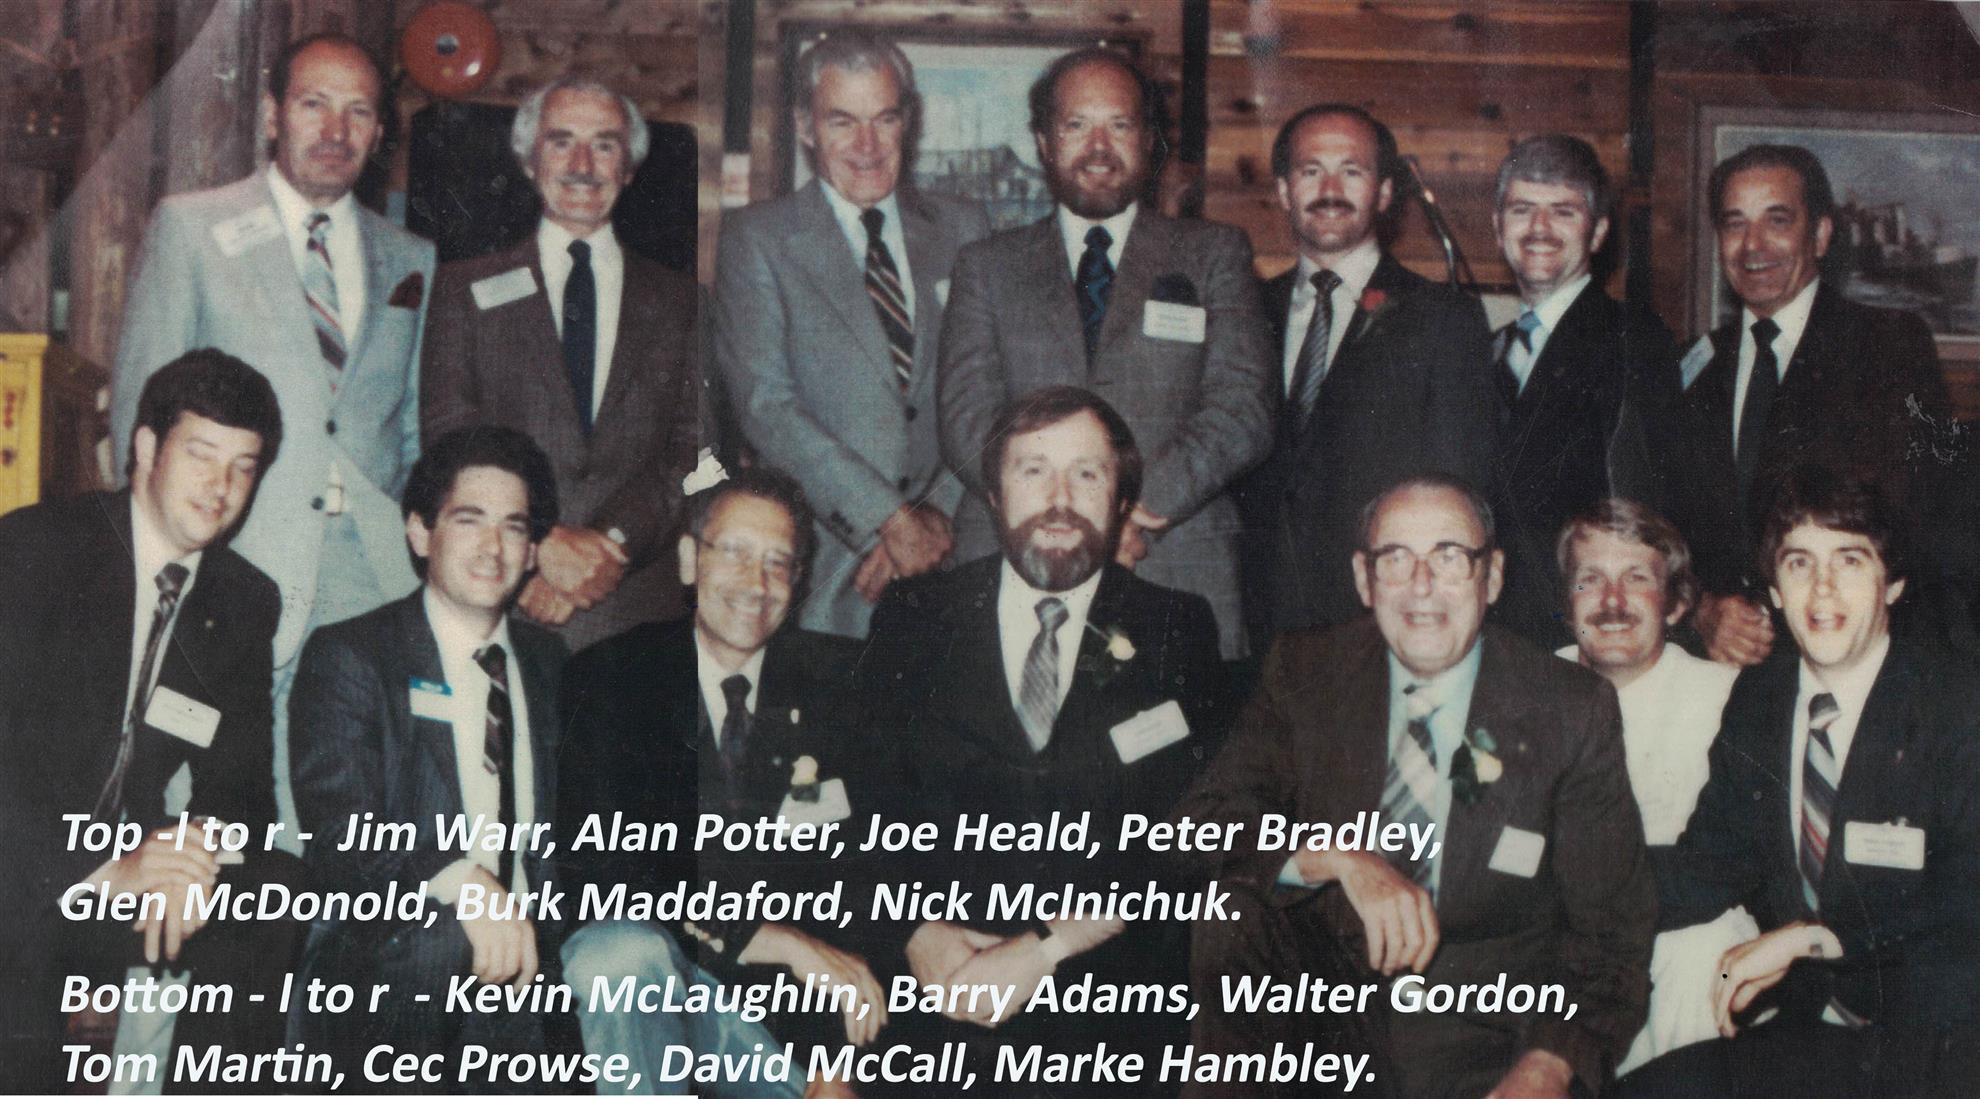 1982, some key members.